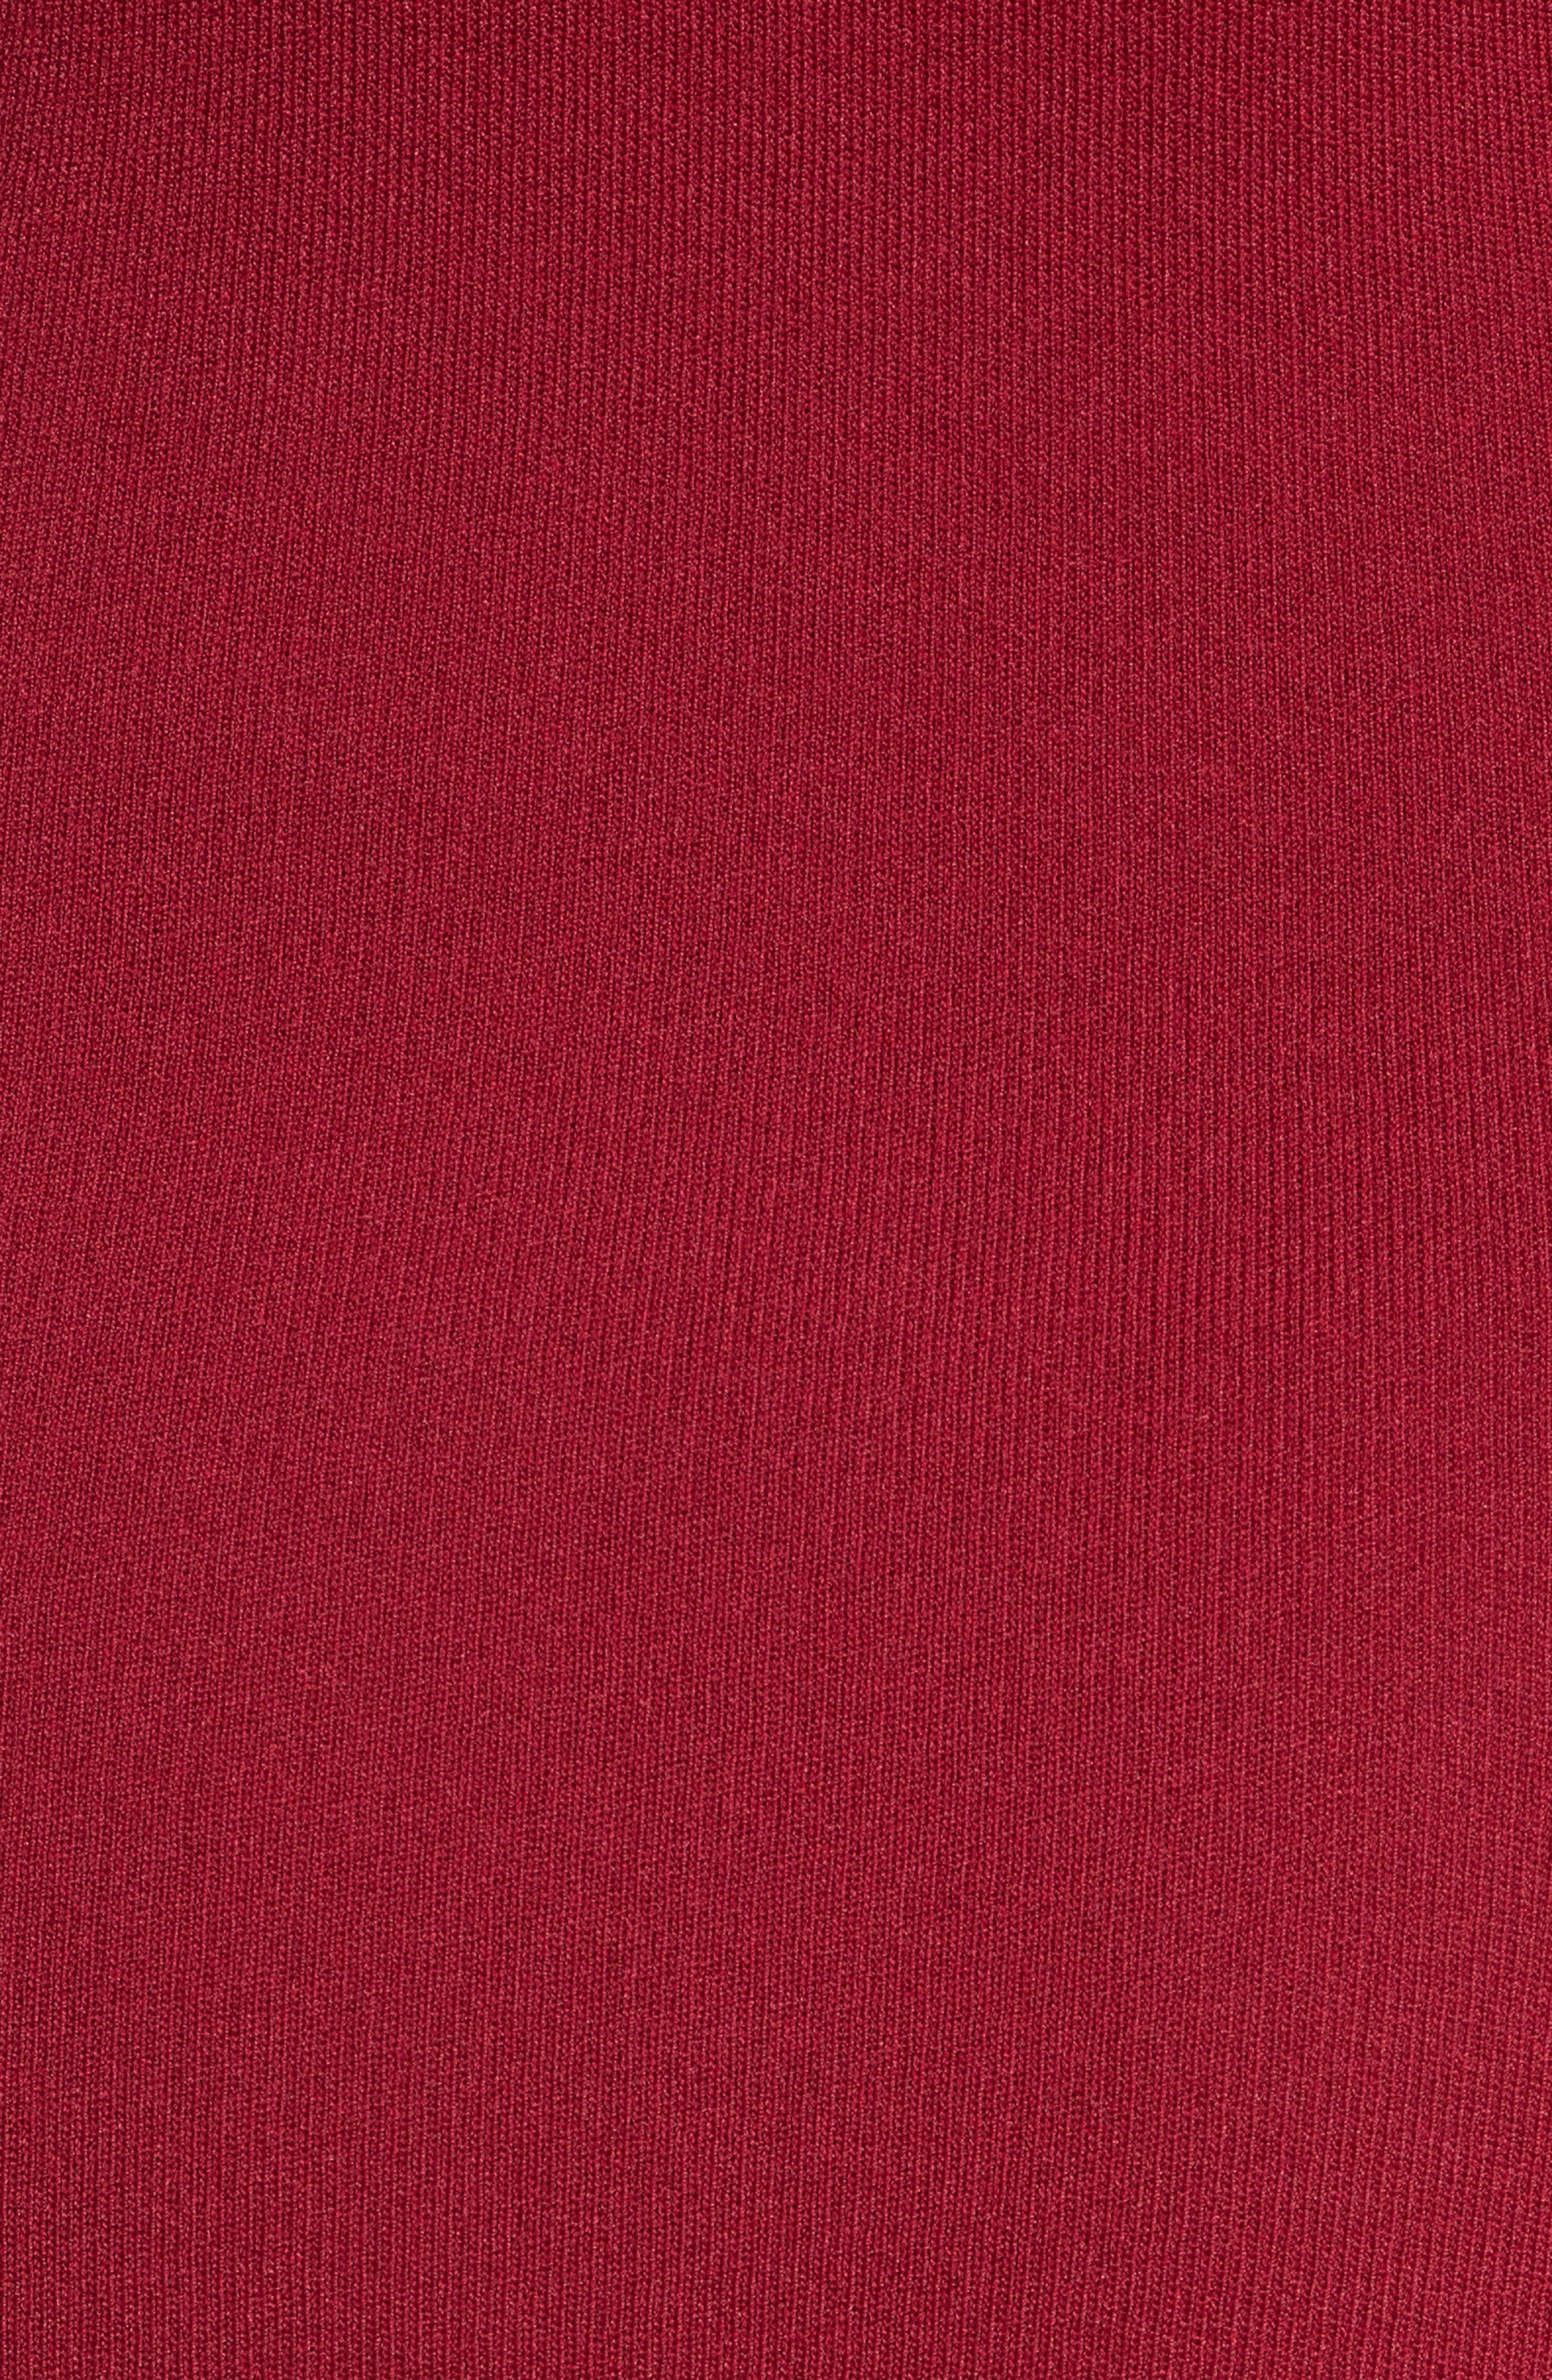 Slashed Knit Ruffle Off the Shoulder Dress,                             Alternate thumbnail 5, color,                             604